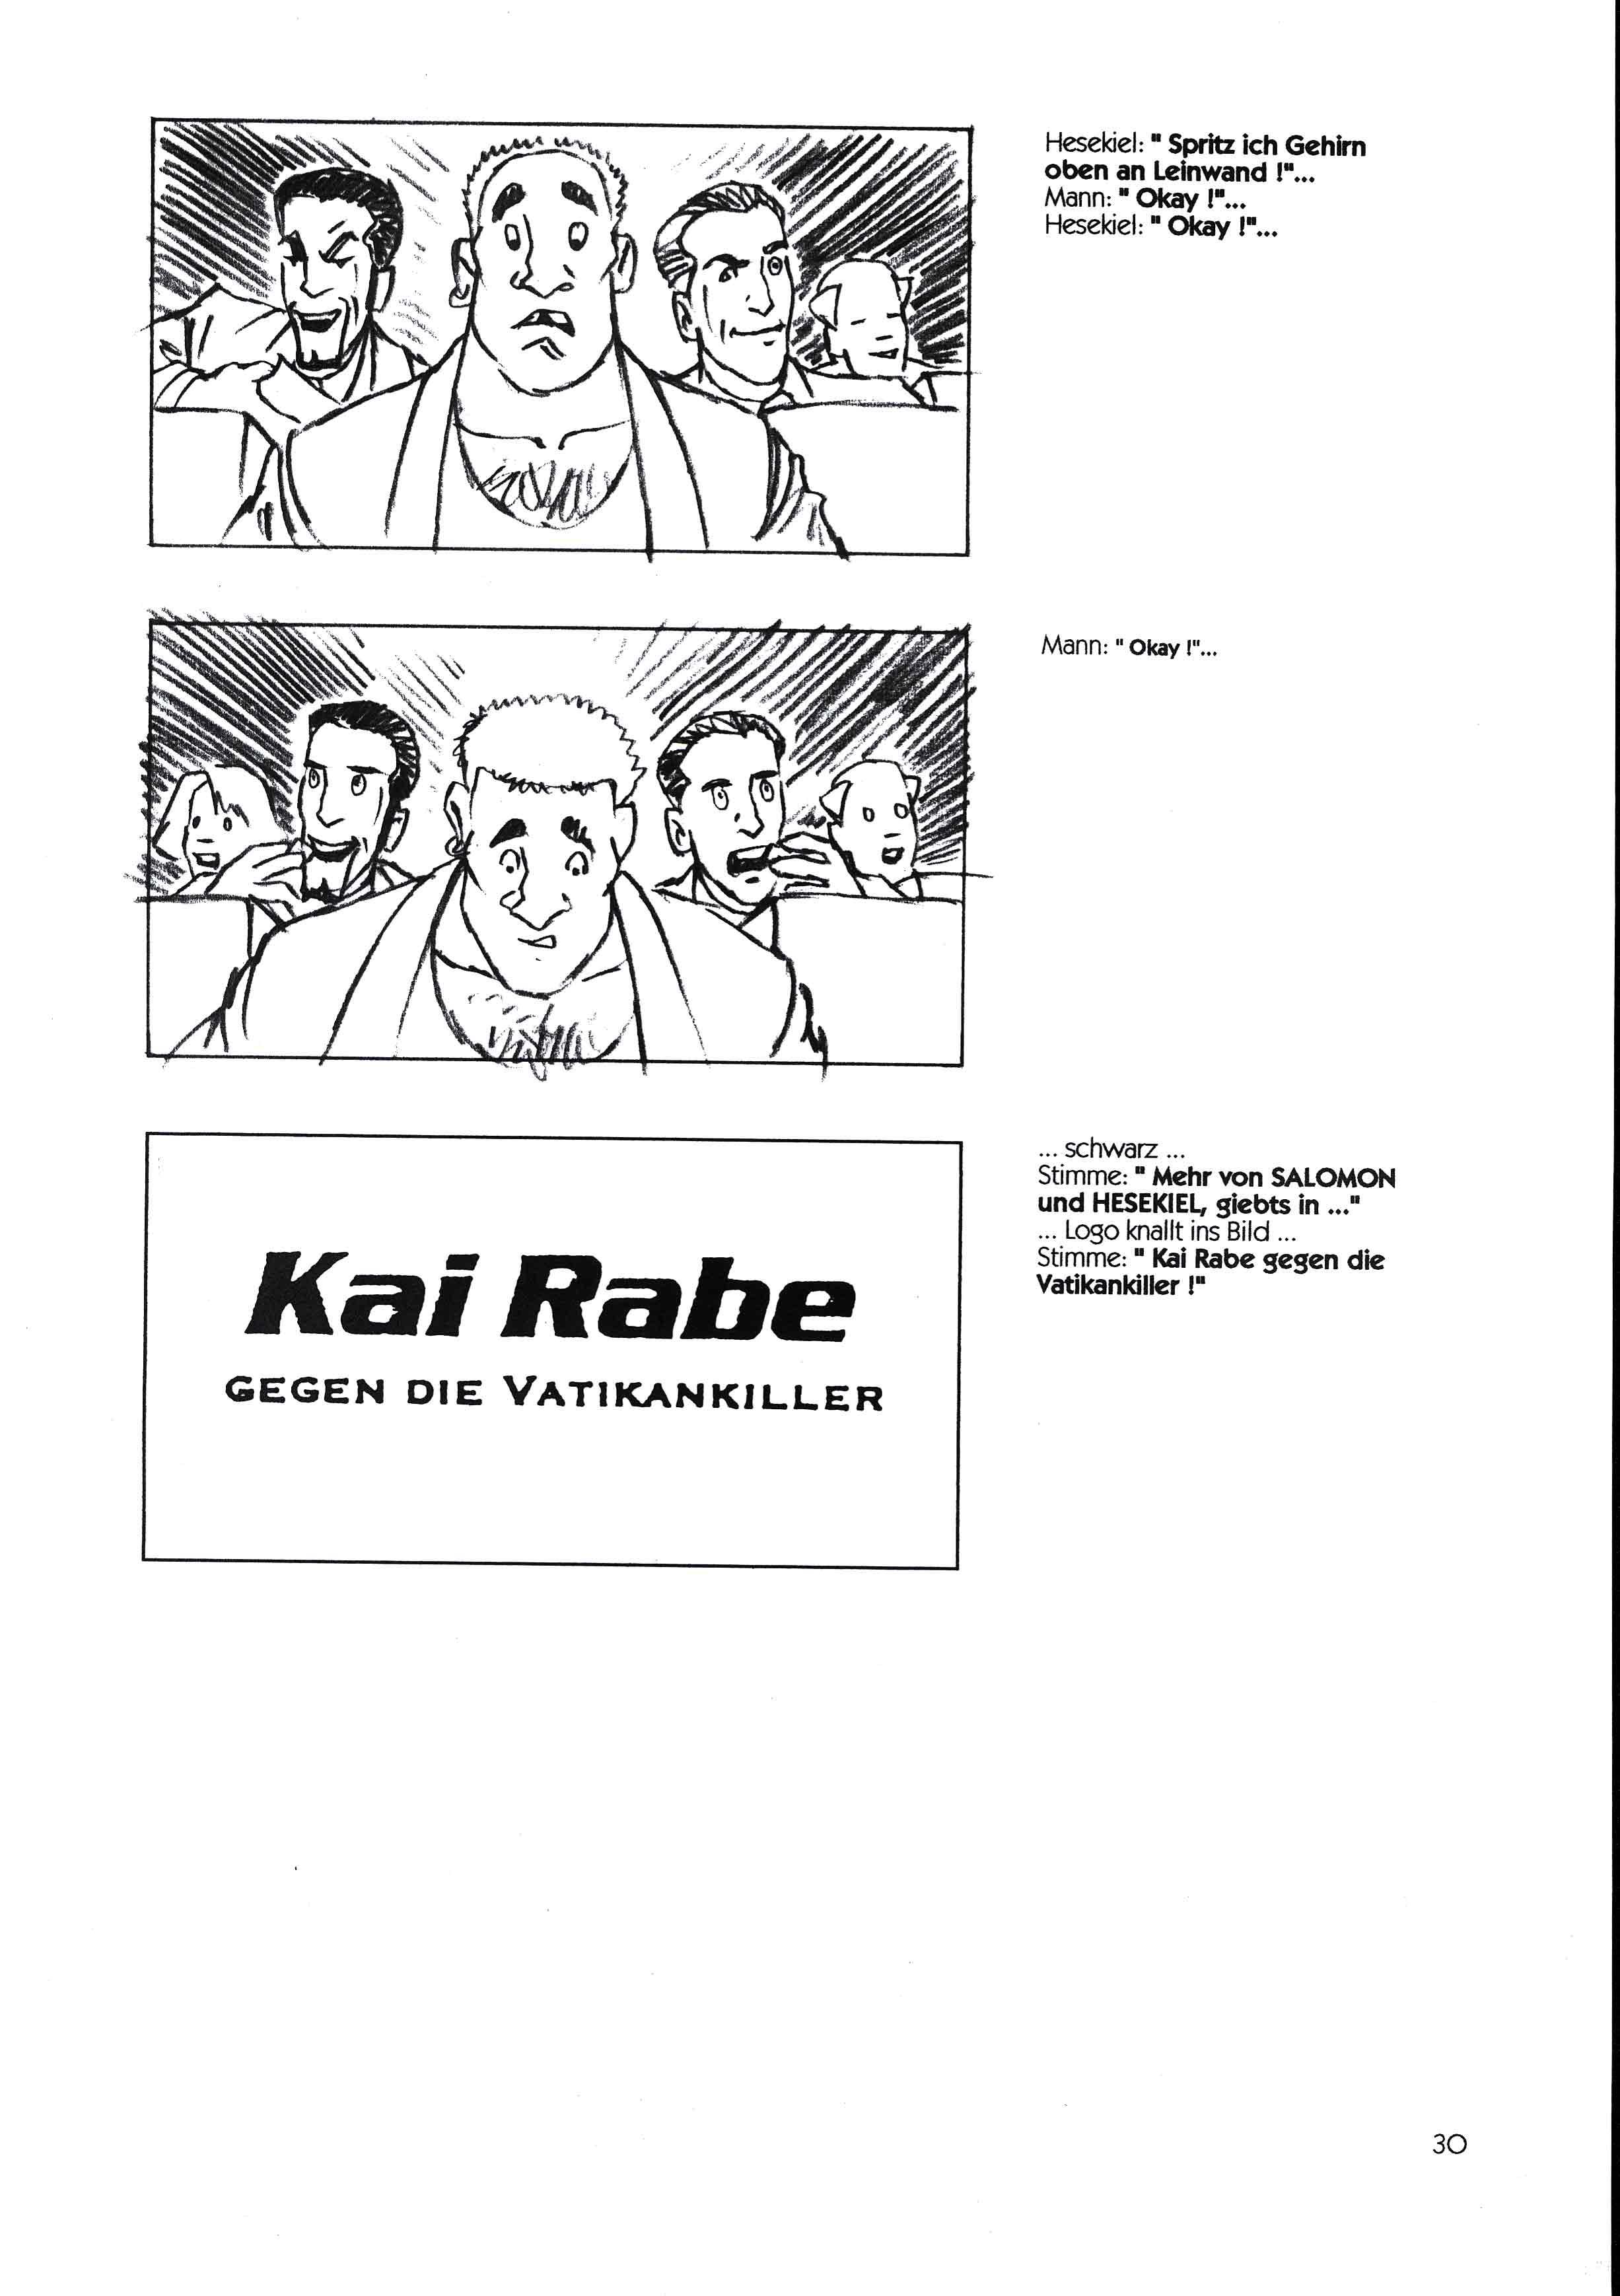 05kairabe-kino-03